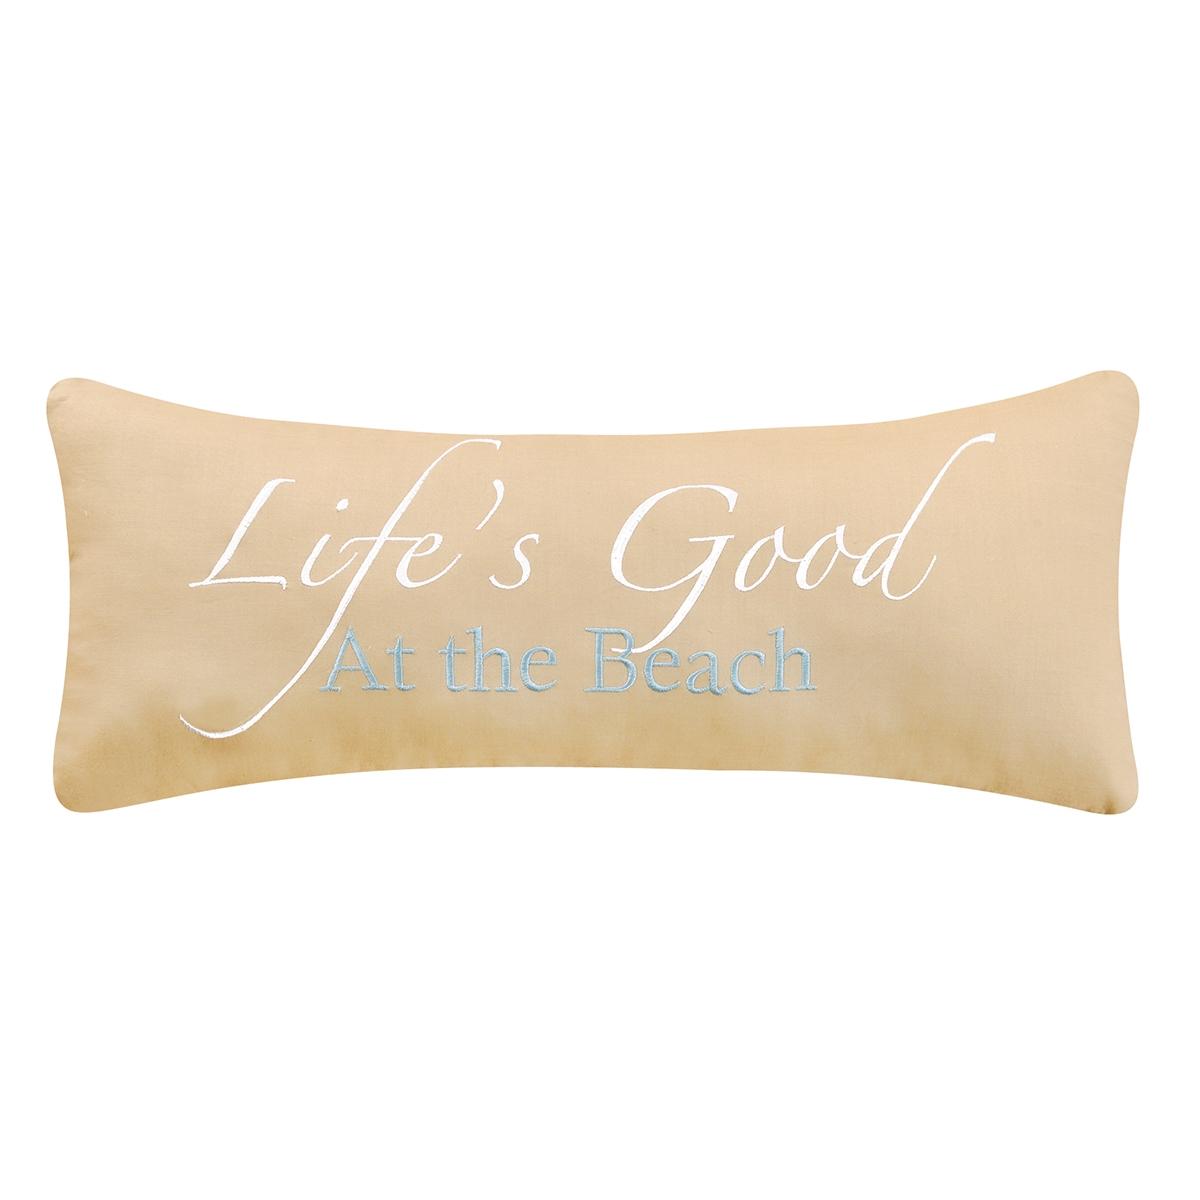 Life's Good At The Beach Pillow